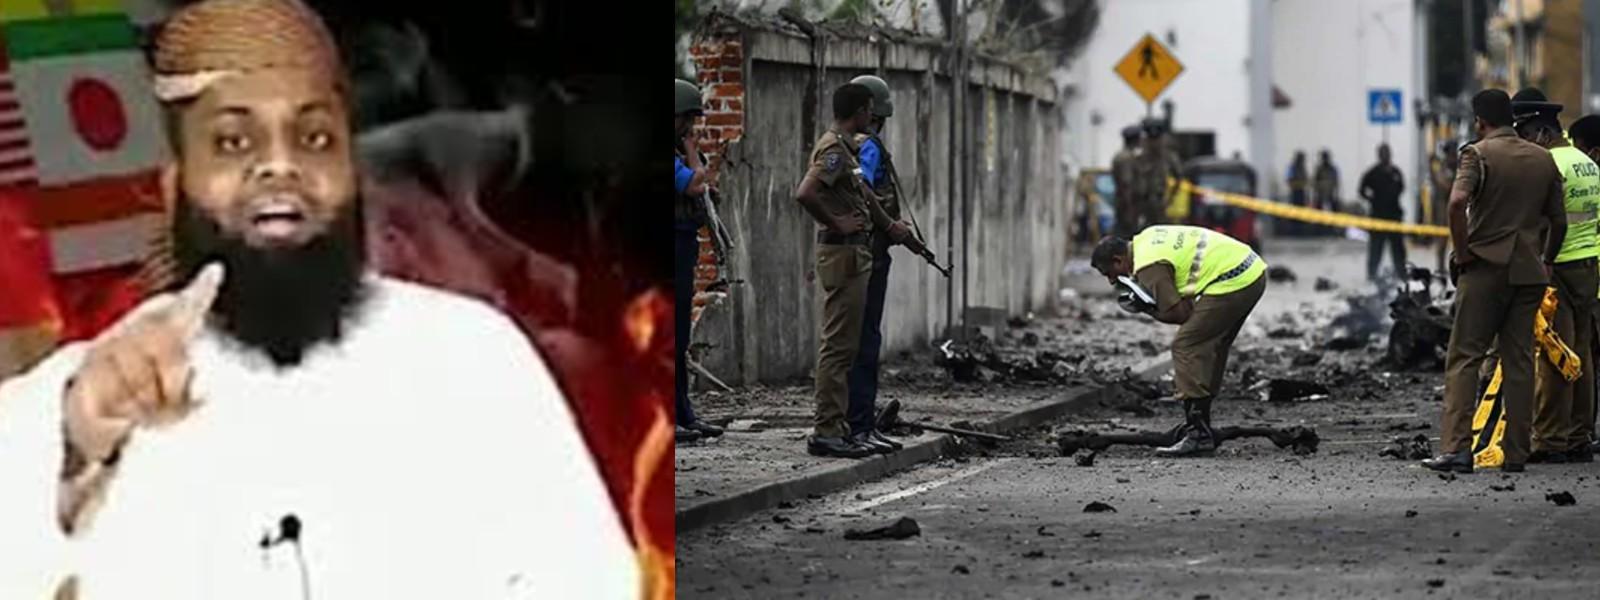 India behind April Attacks? BBC report raises concerns